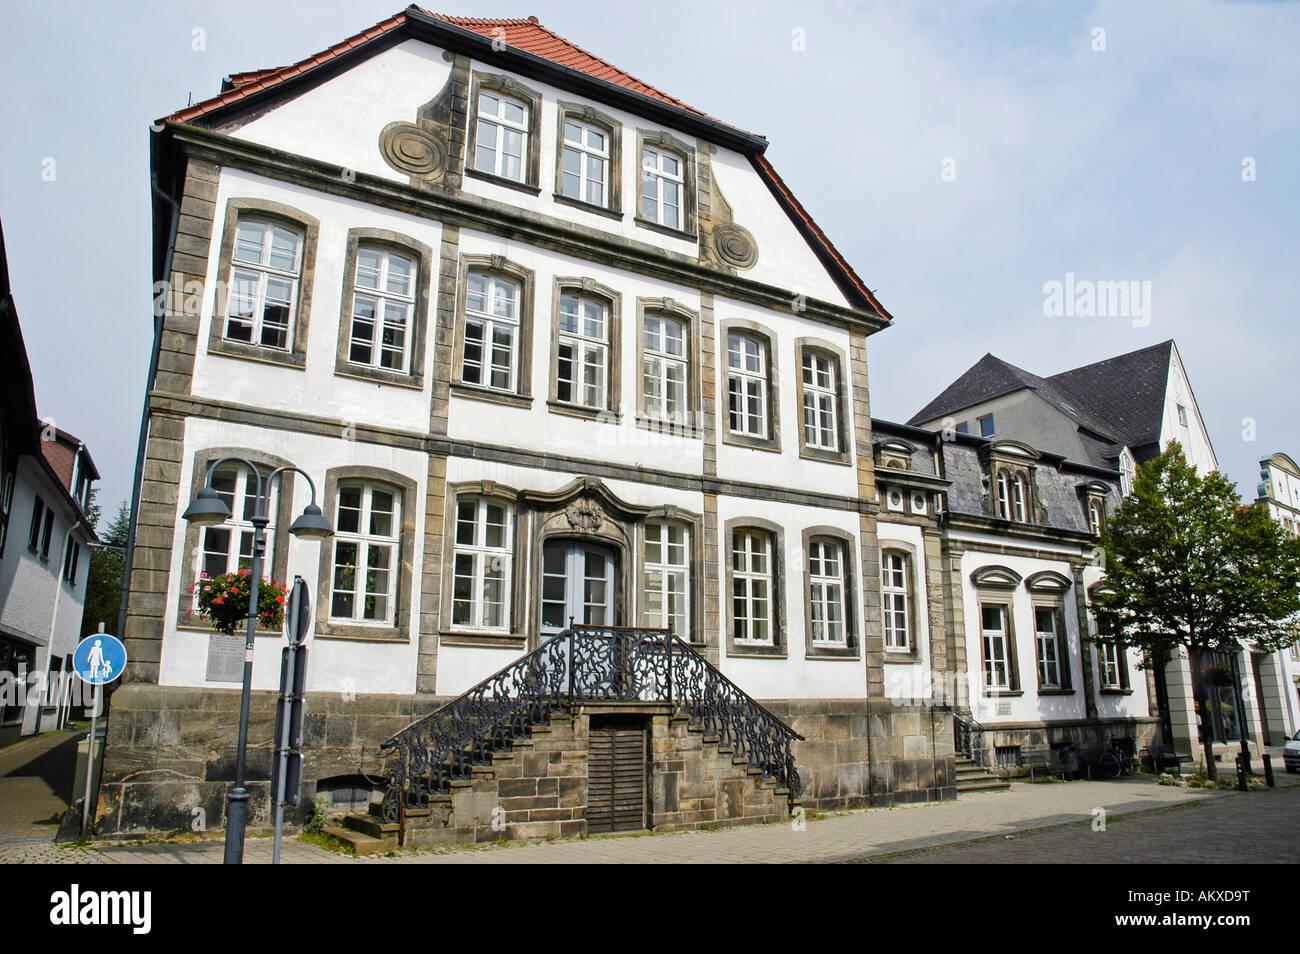 Baroque townhouse, Horn-Bad Meinberg, North Rhine-Westphalia, Germany - Stock Image